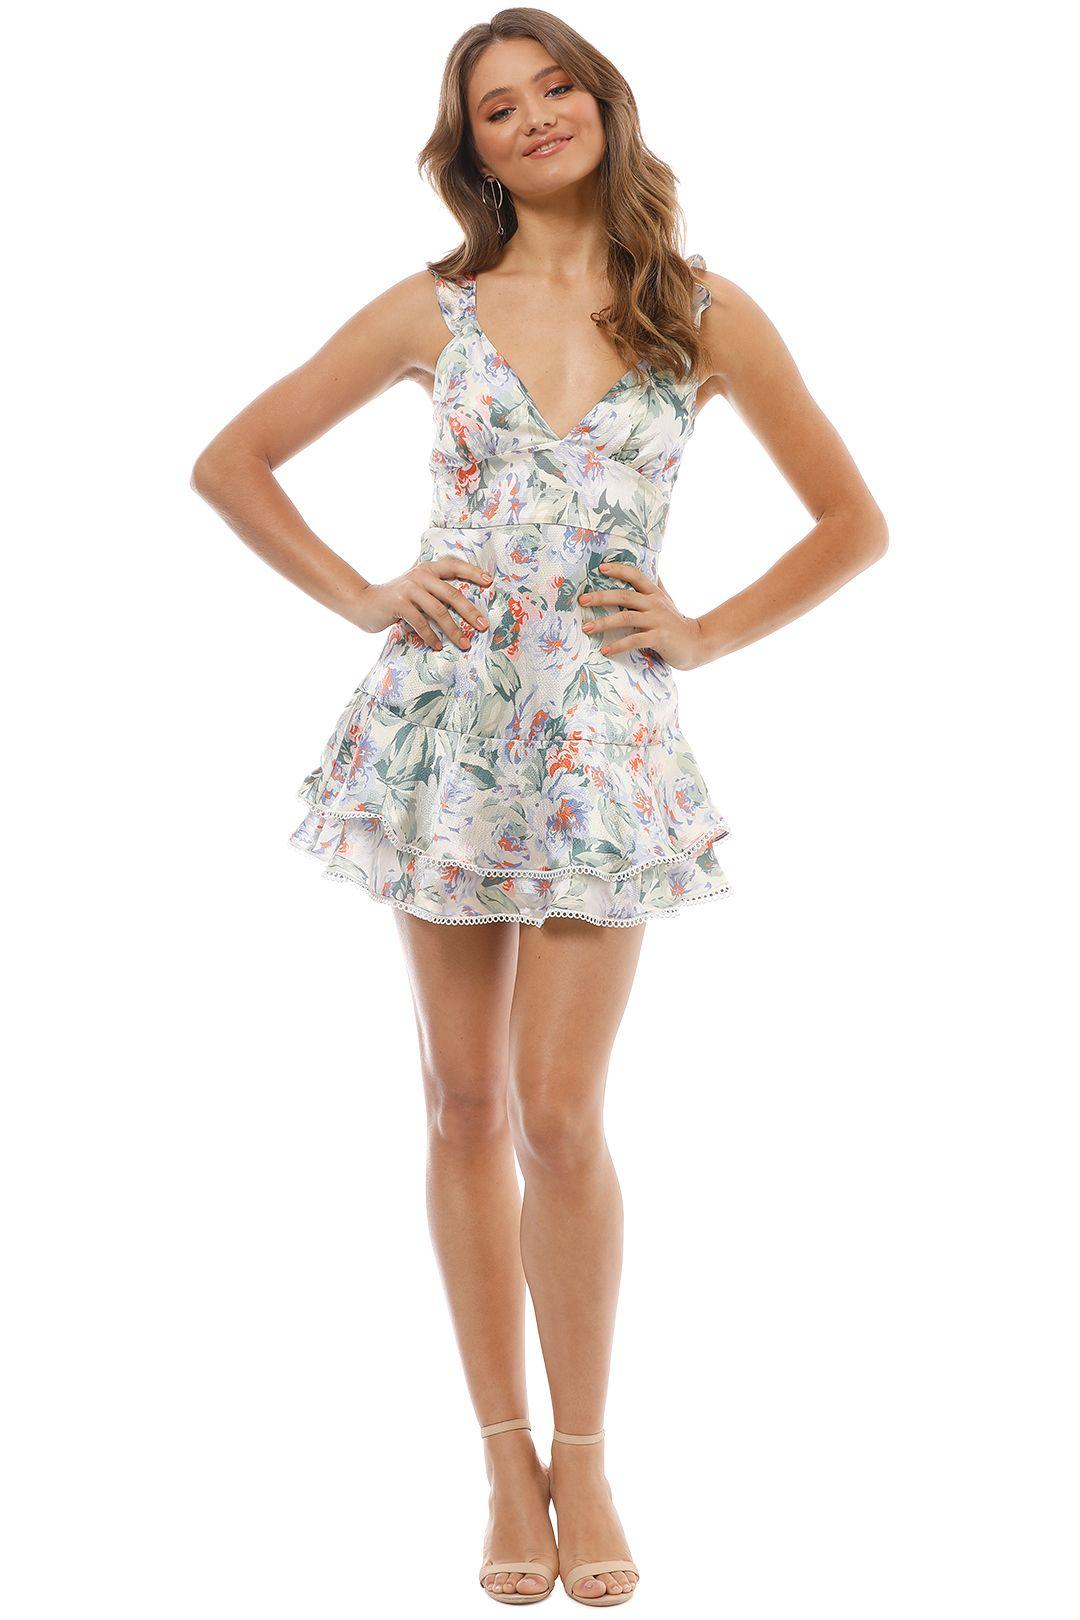 Talulah - Floral Mist Mini Dress - Multi - Front